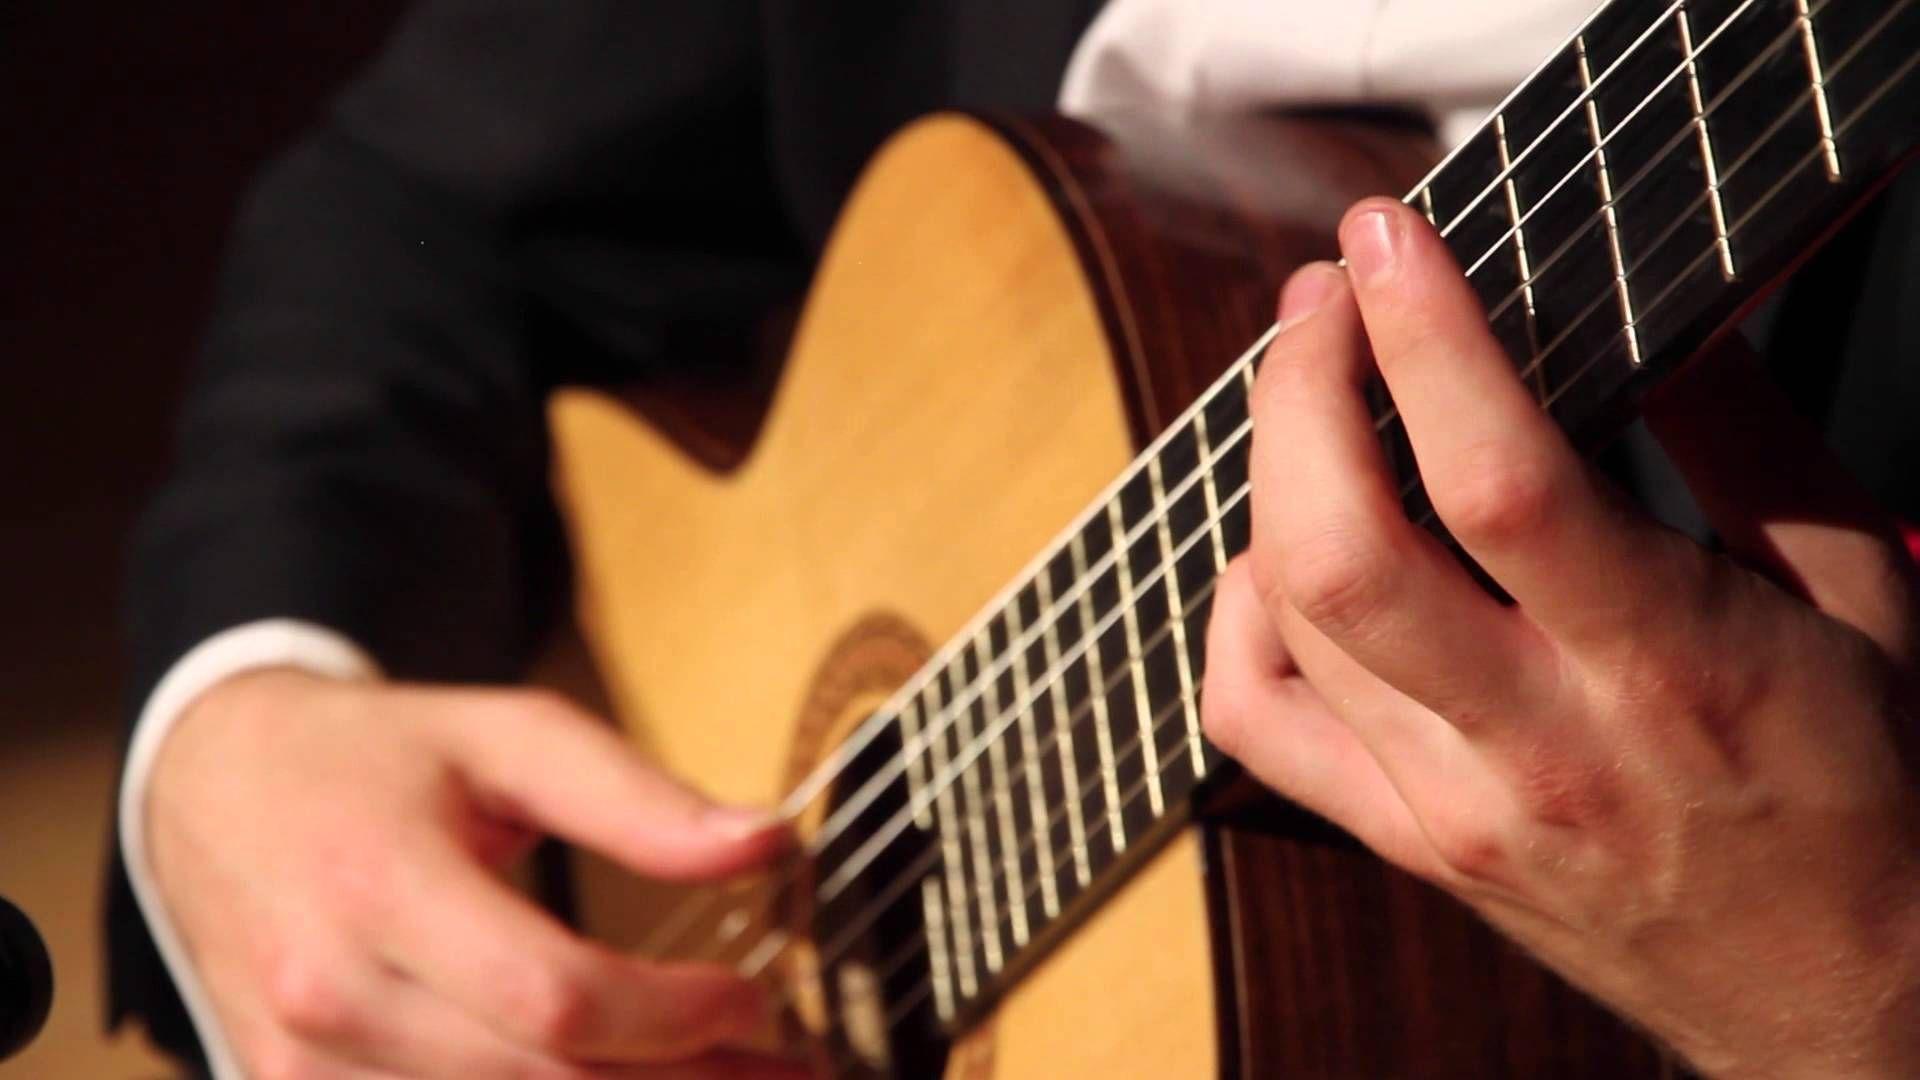 Classical Guitar Joaquín Rodrigo Adagio From Concierto De Aranjuez Classical Music Young Musician Classical Guitar